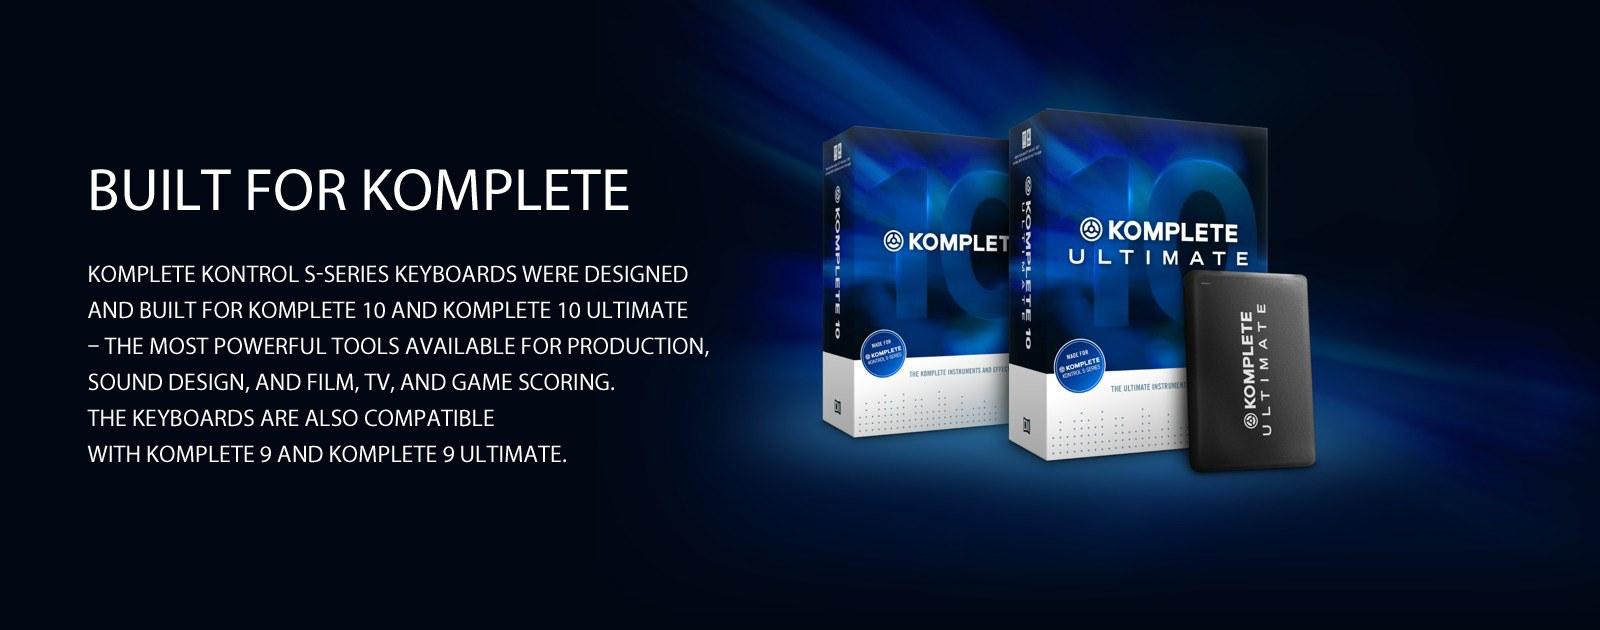 komplete kontrol - built for komplete